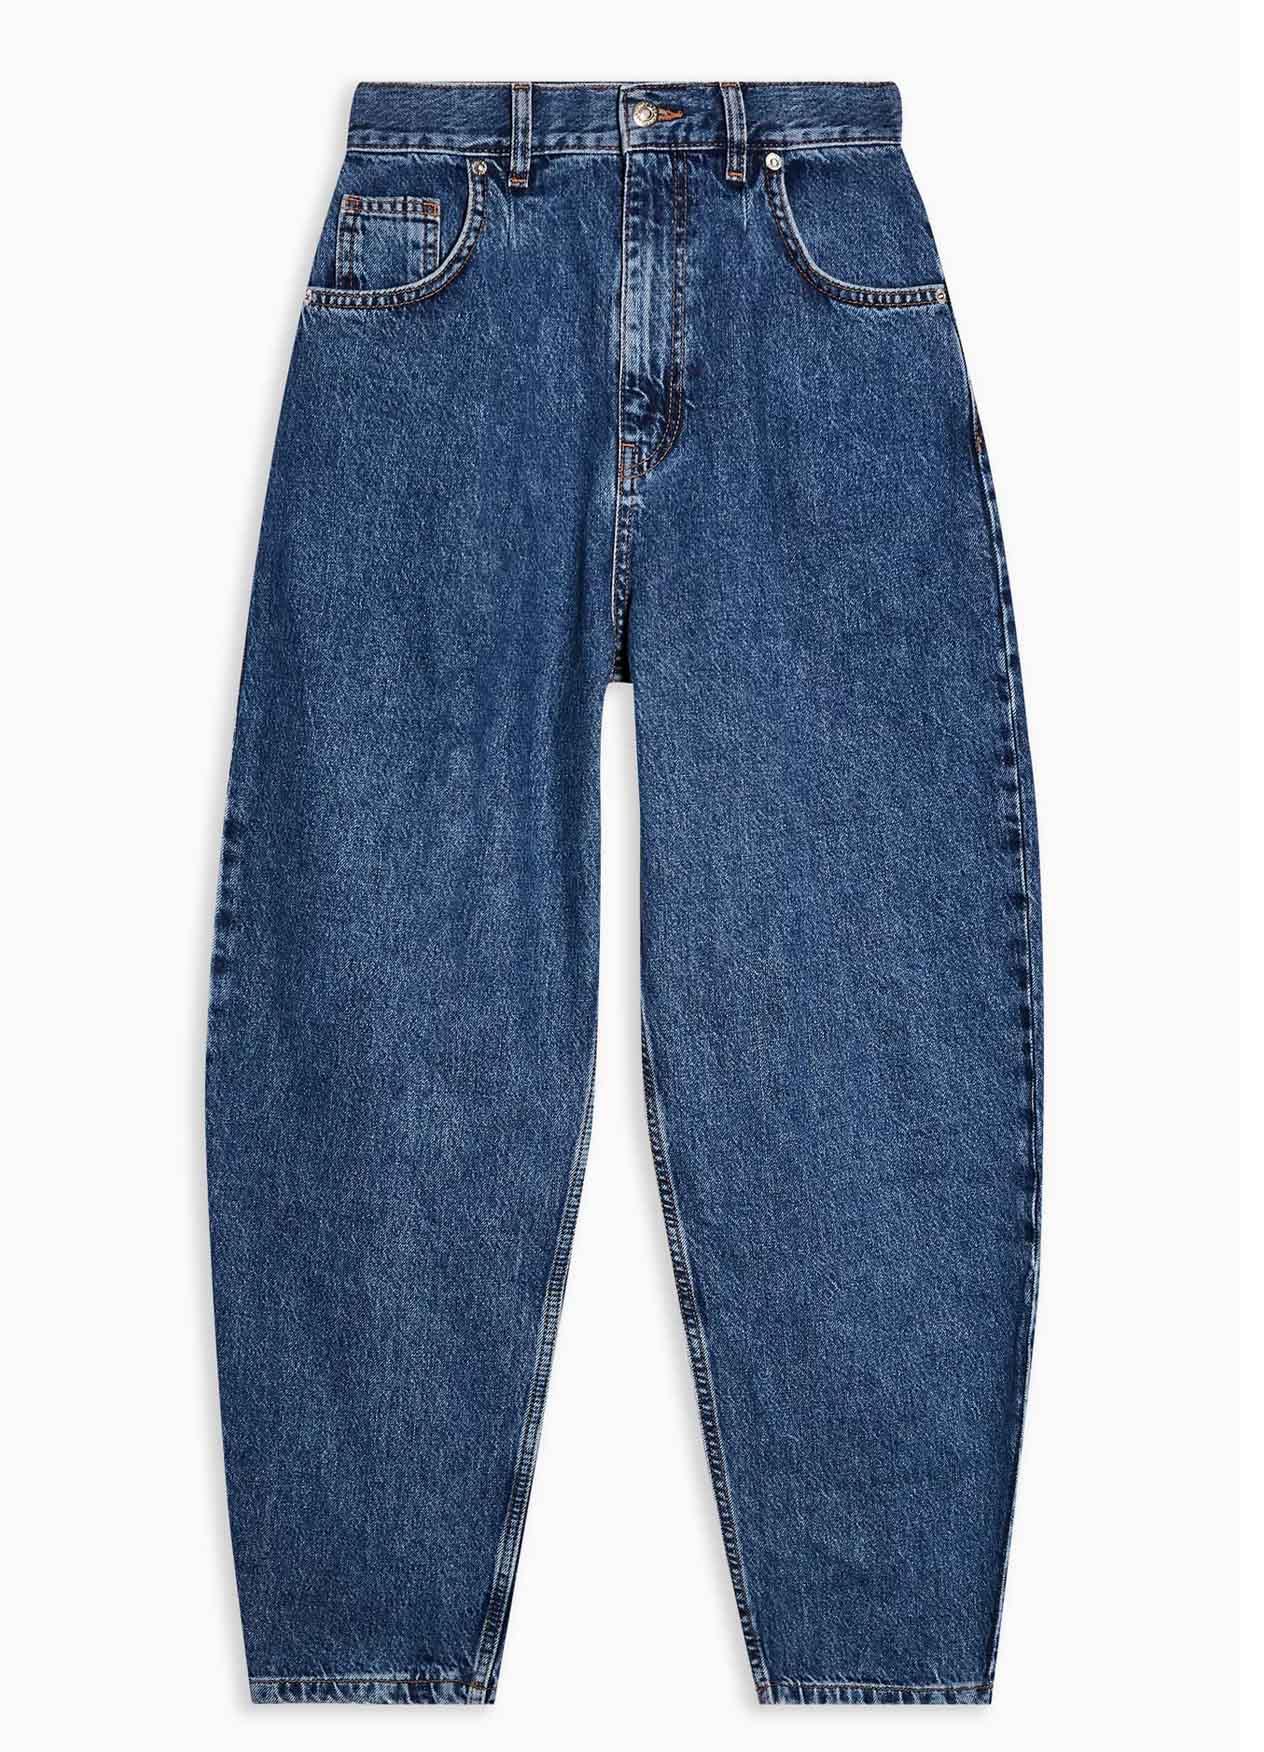 ballon jeans topshop